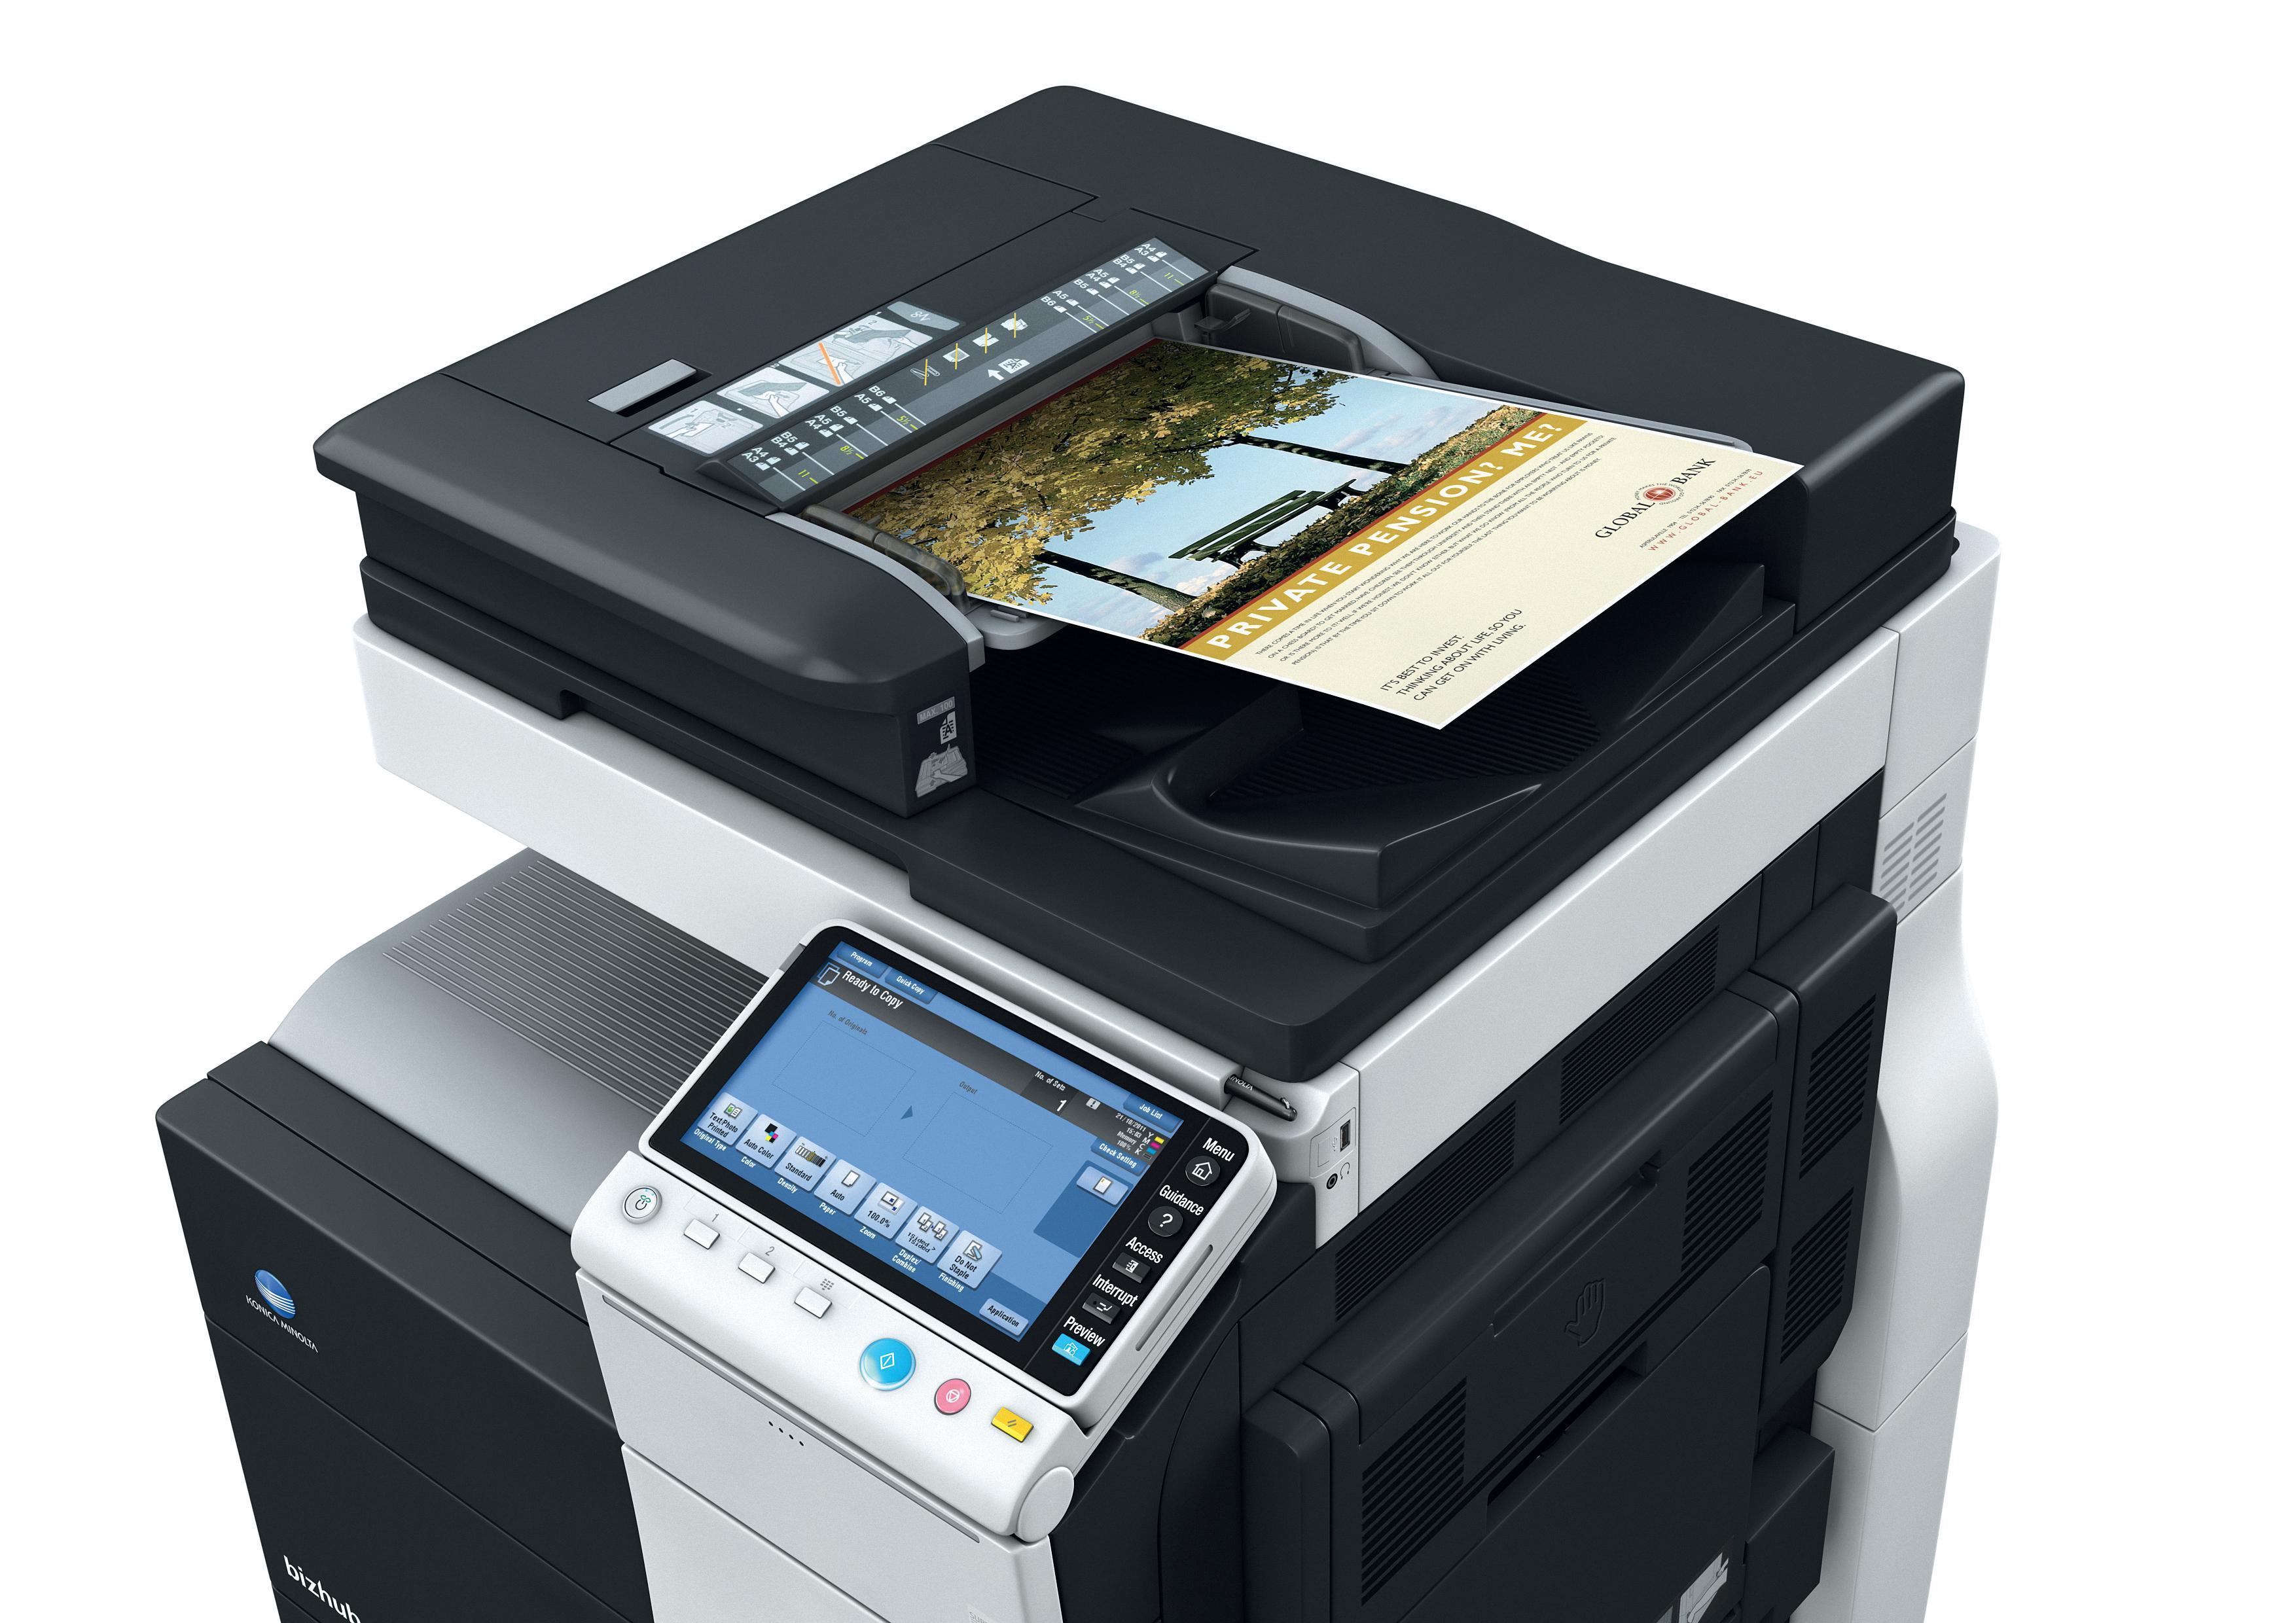 Konica Minolta Bizhub C284 Color Copier Printer Scanner